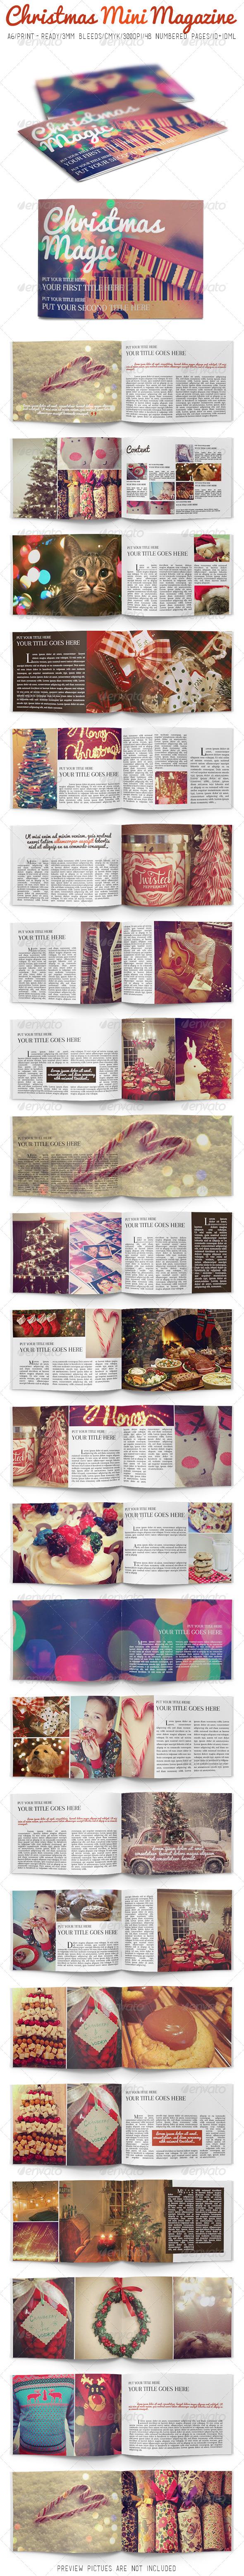 Christmas Mini Magazine - Magazines Print Templates